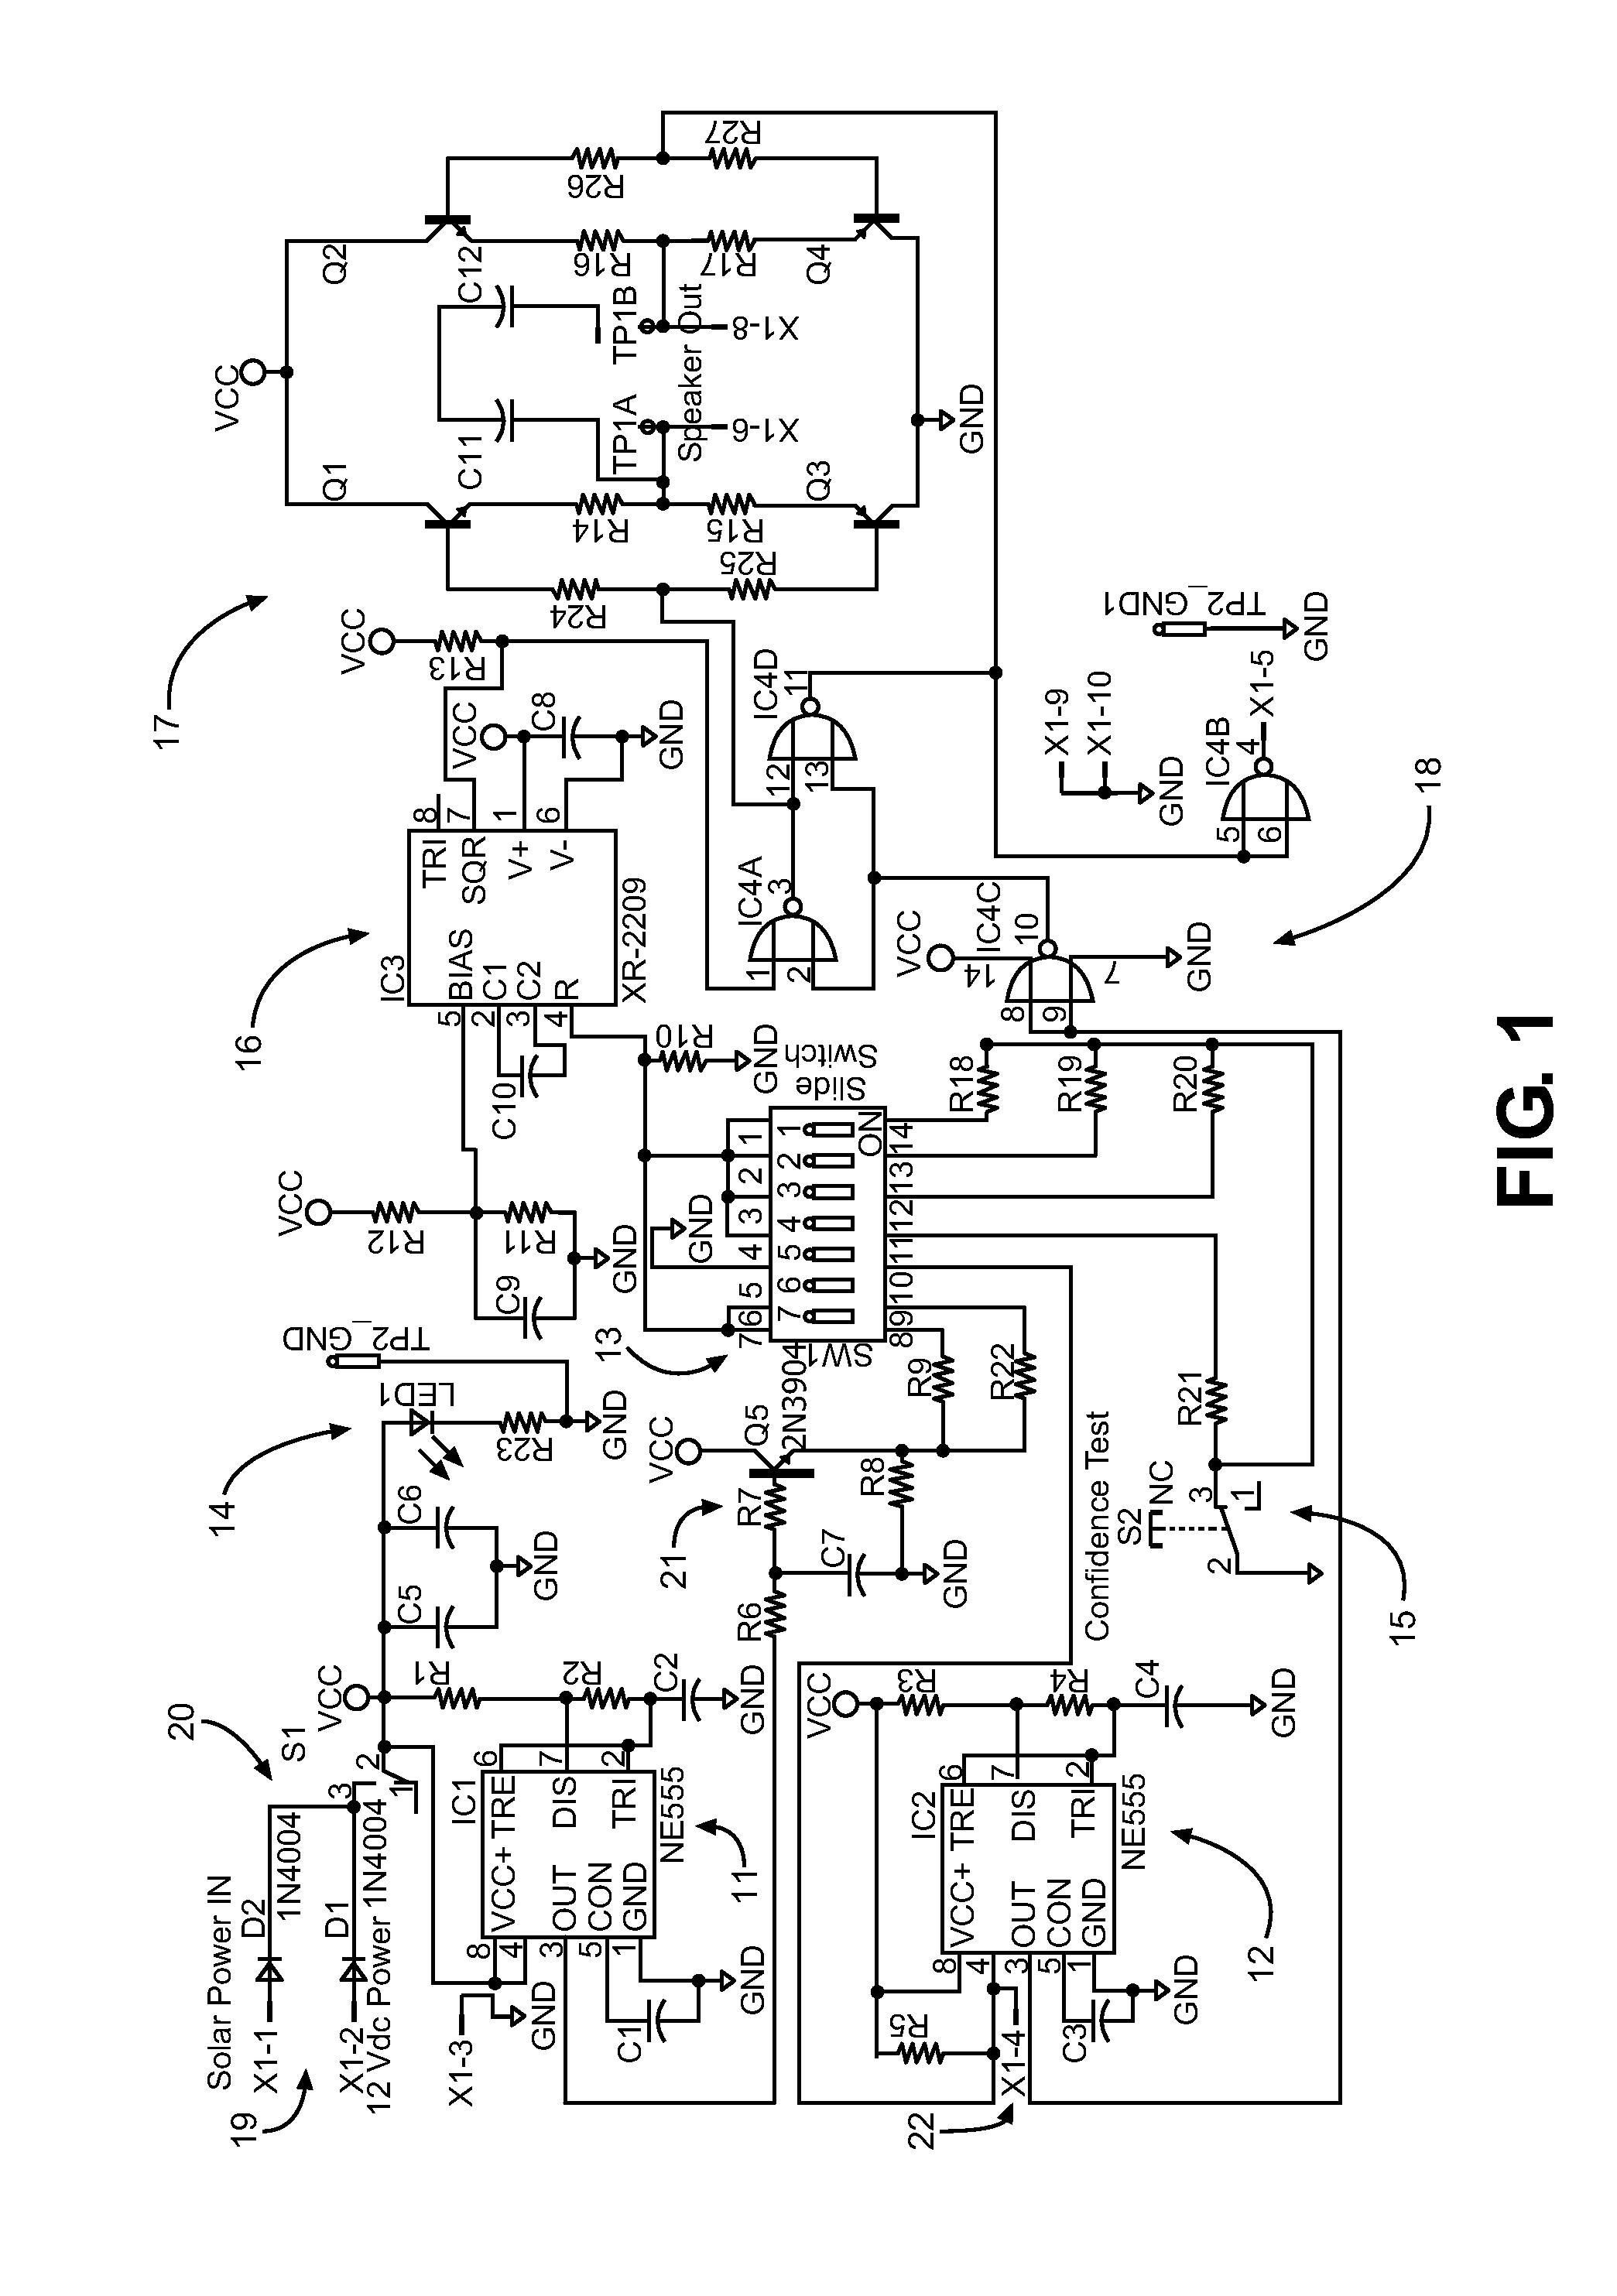 Gmc Envoy Denali As Well Peterbilt 379 Wiring Diagram On 1996 Gmc